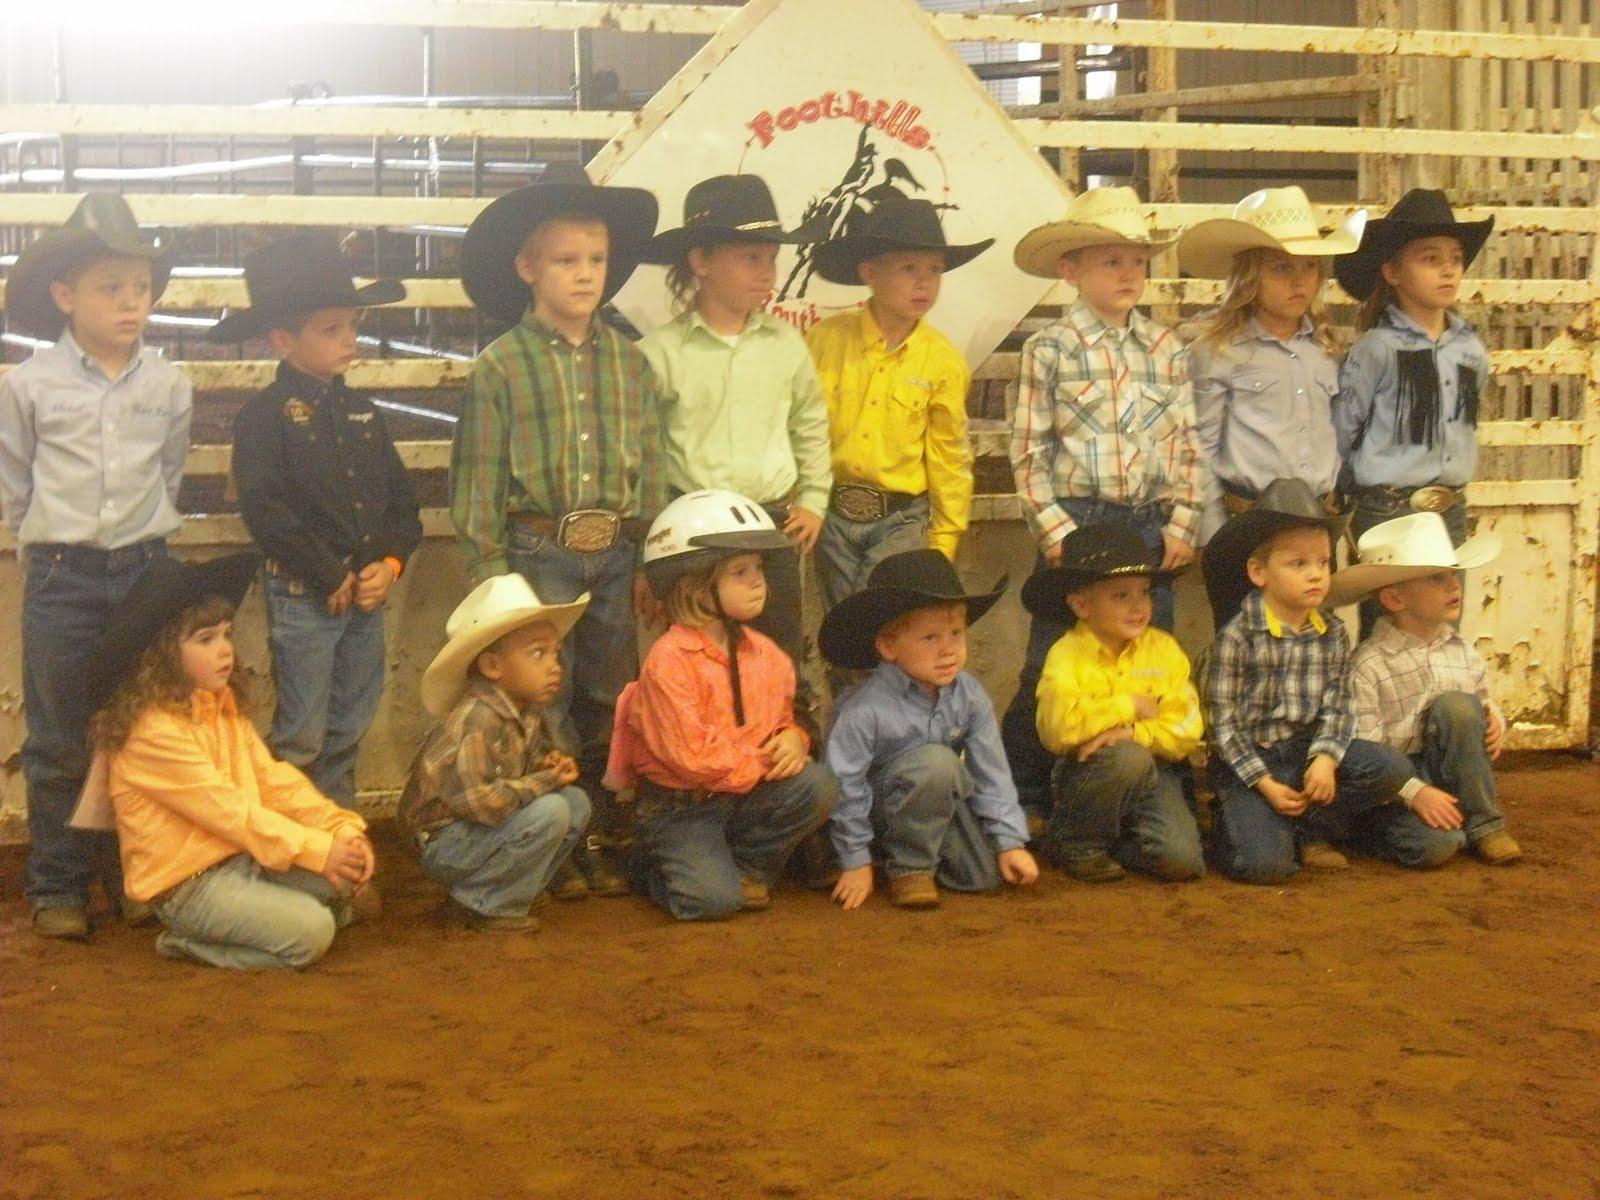 Littlest Cowboy November 2009